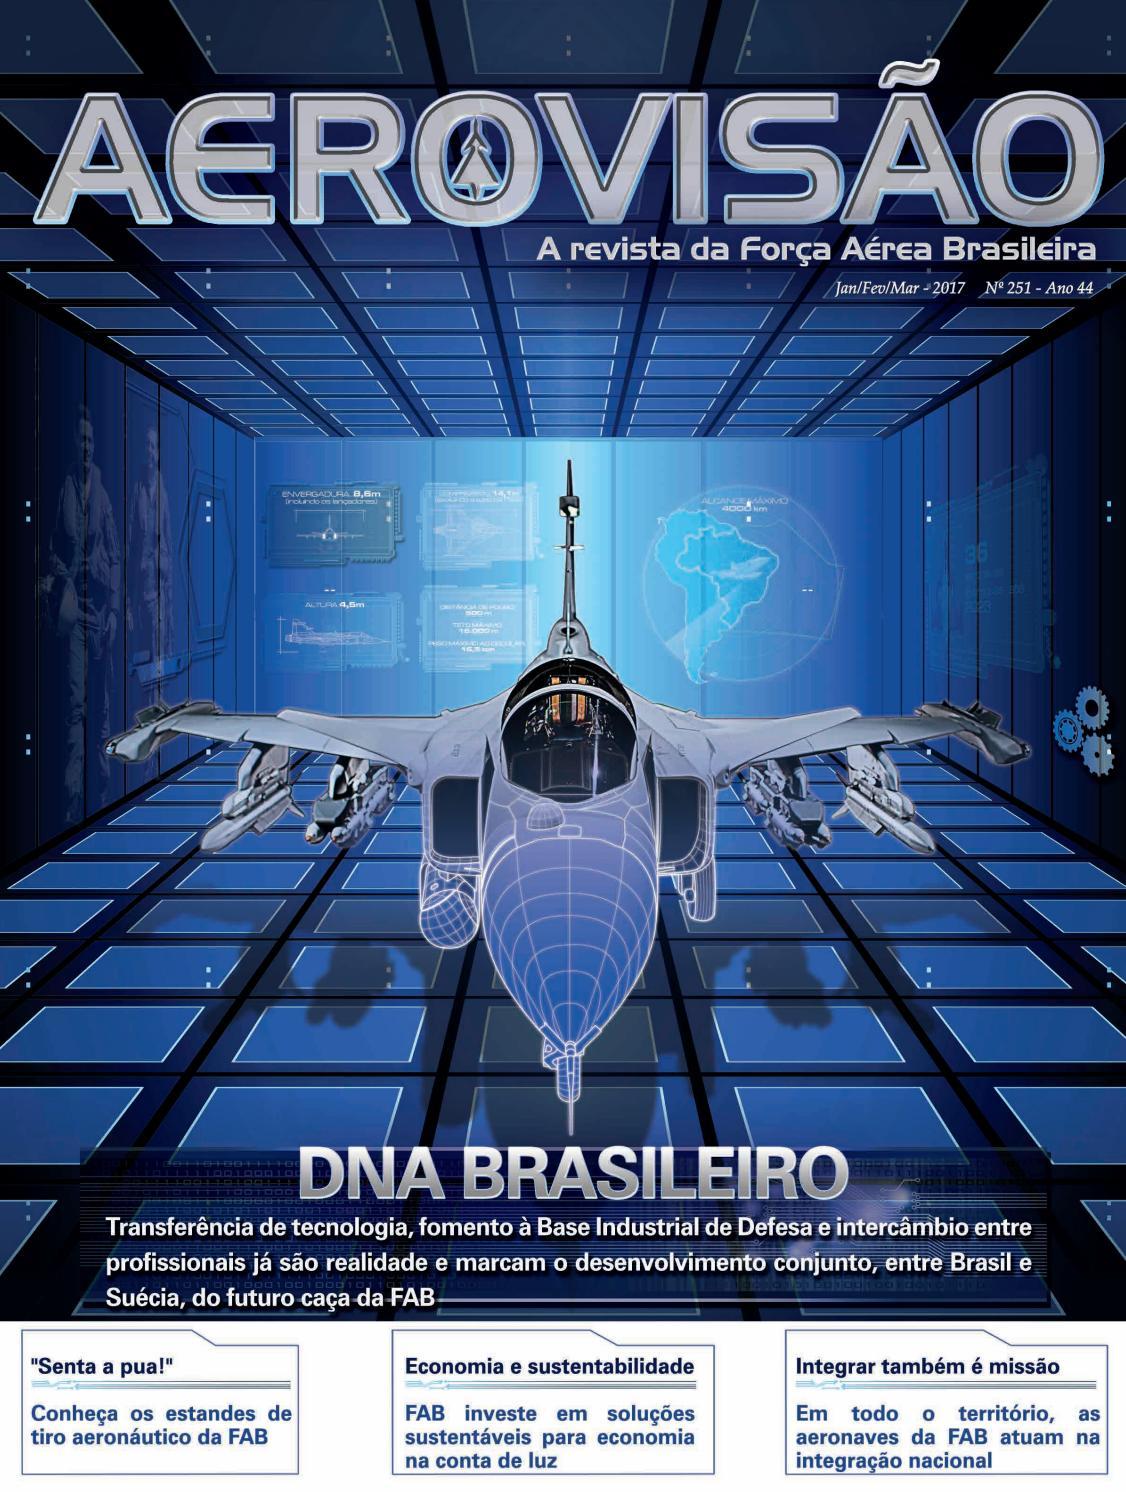 028ba6ae251 Aerovisão nº 251 JAN FEV MAR by Força Aérea Brasileira - issuu